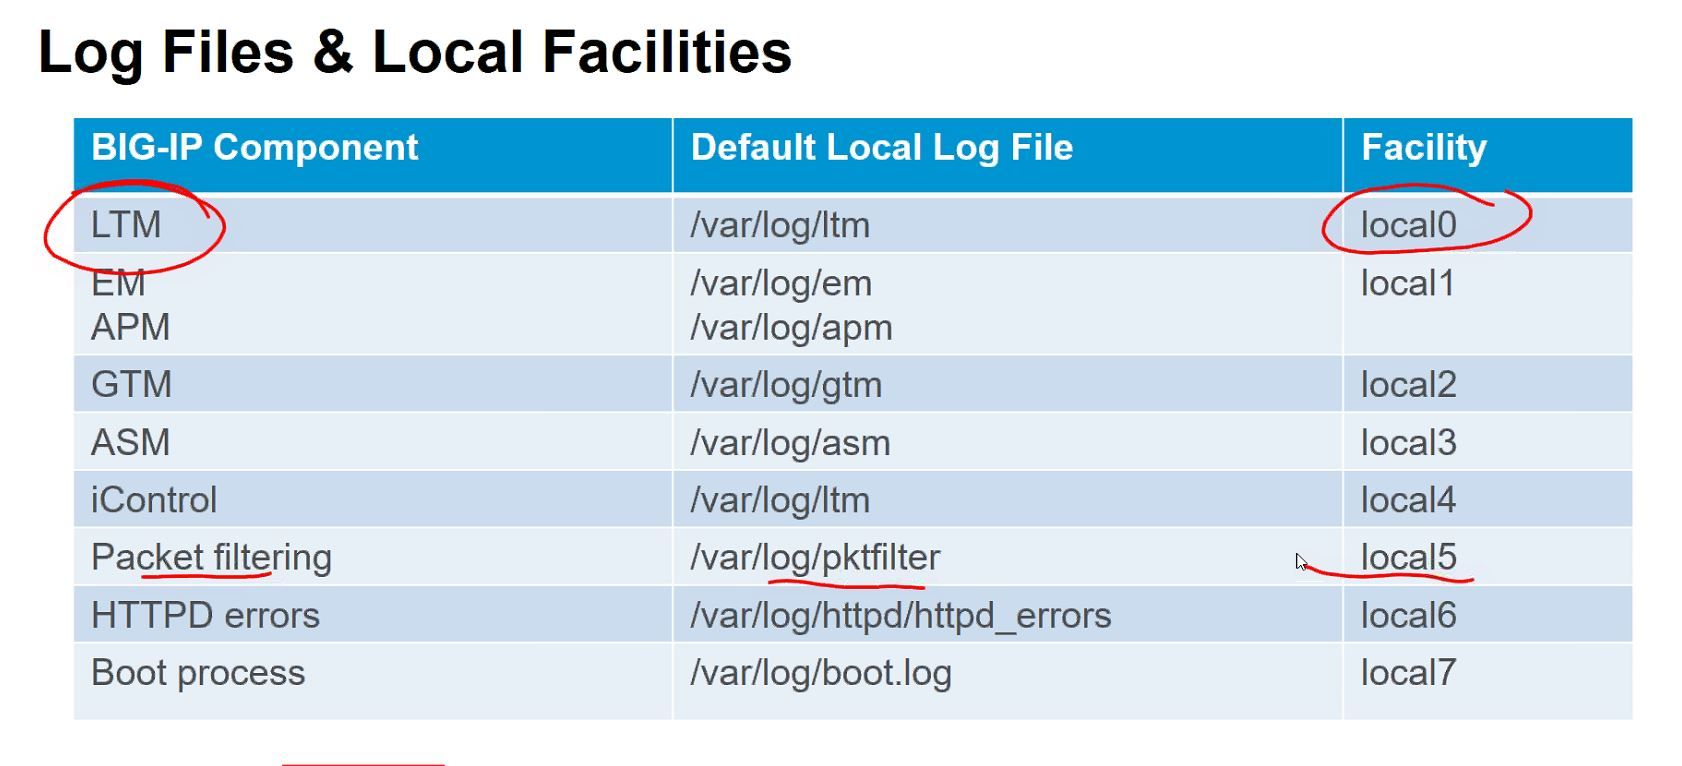 F5 SNMP facilities.JPG